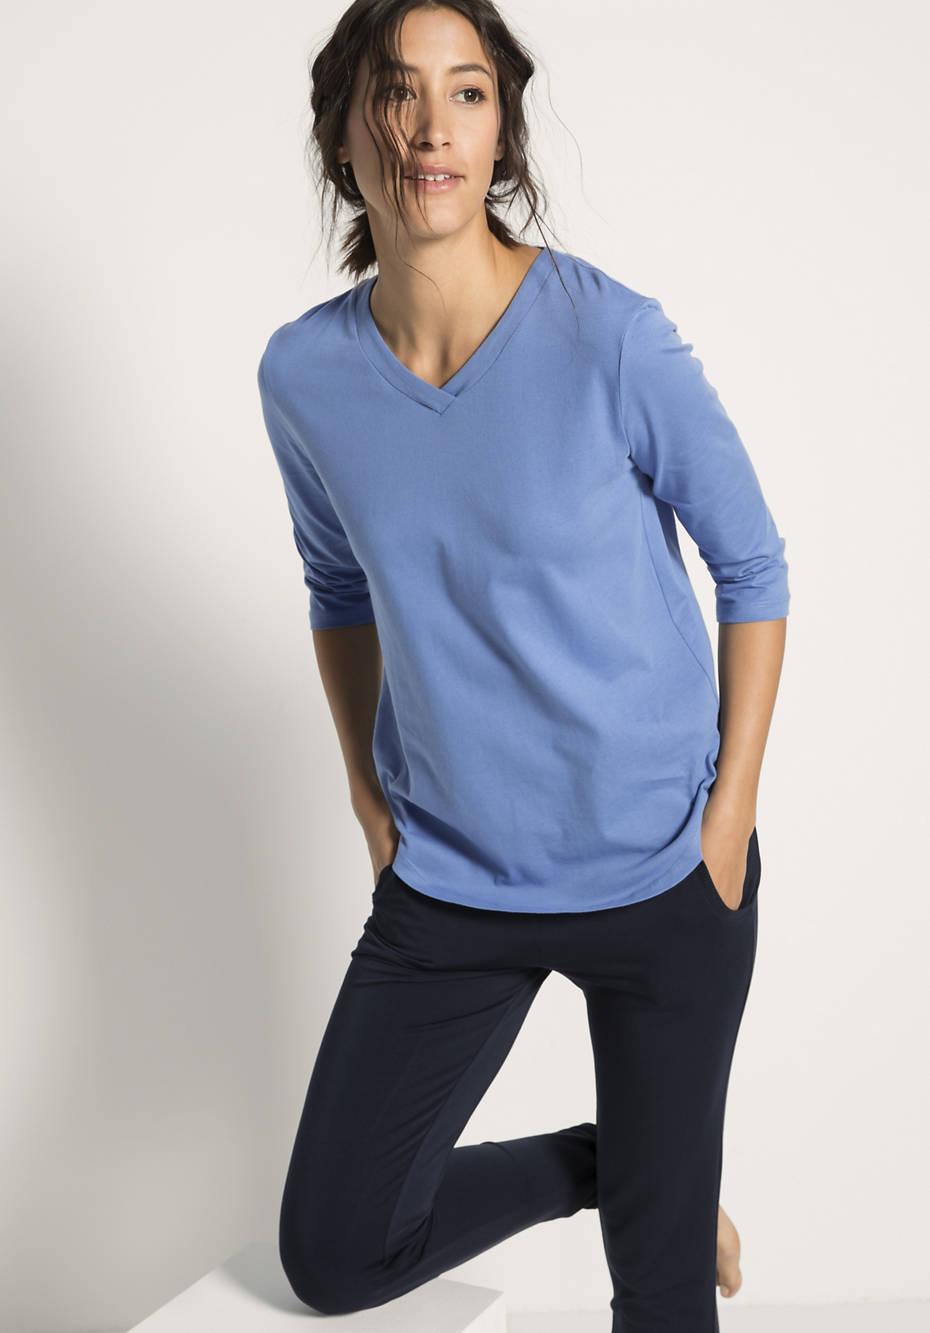 Shirt aus Bio-Baumwolle mit Kapok